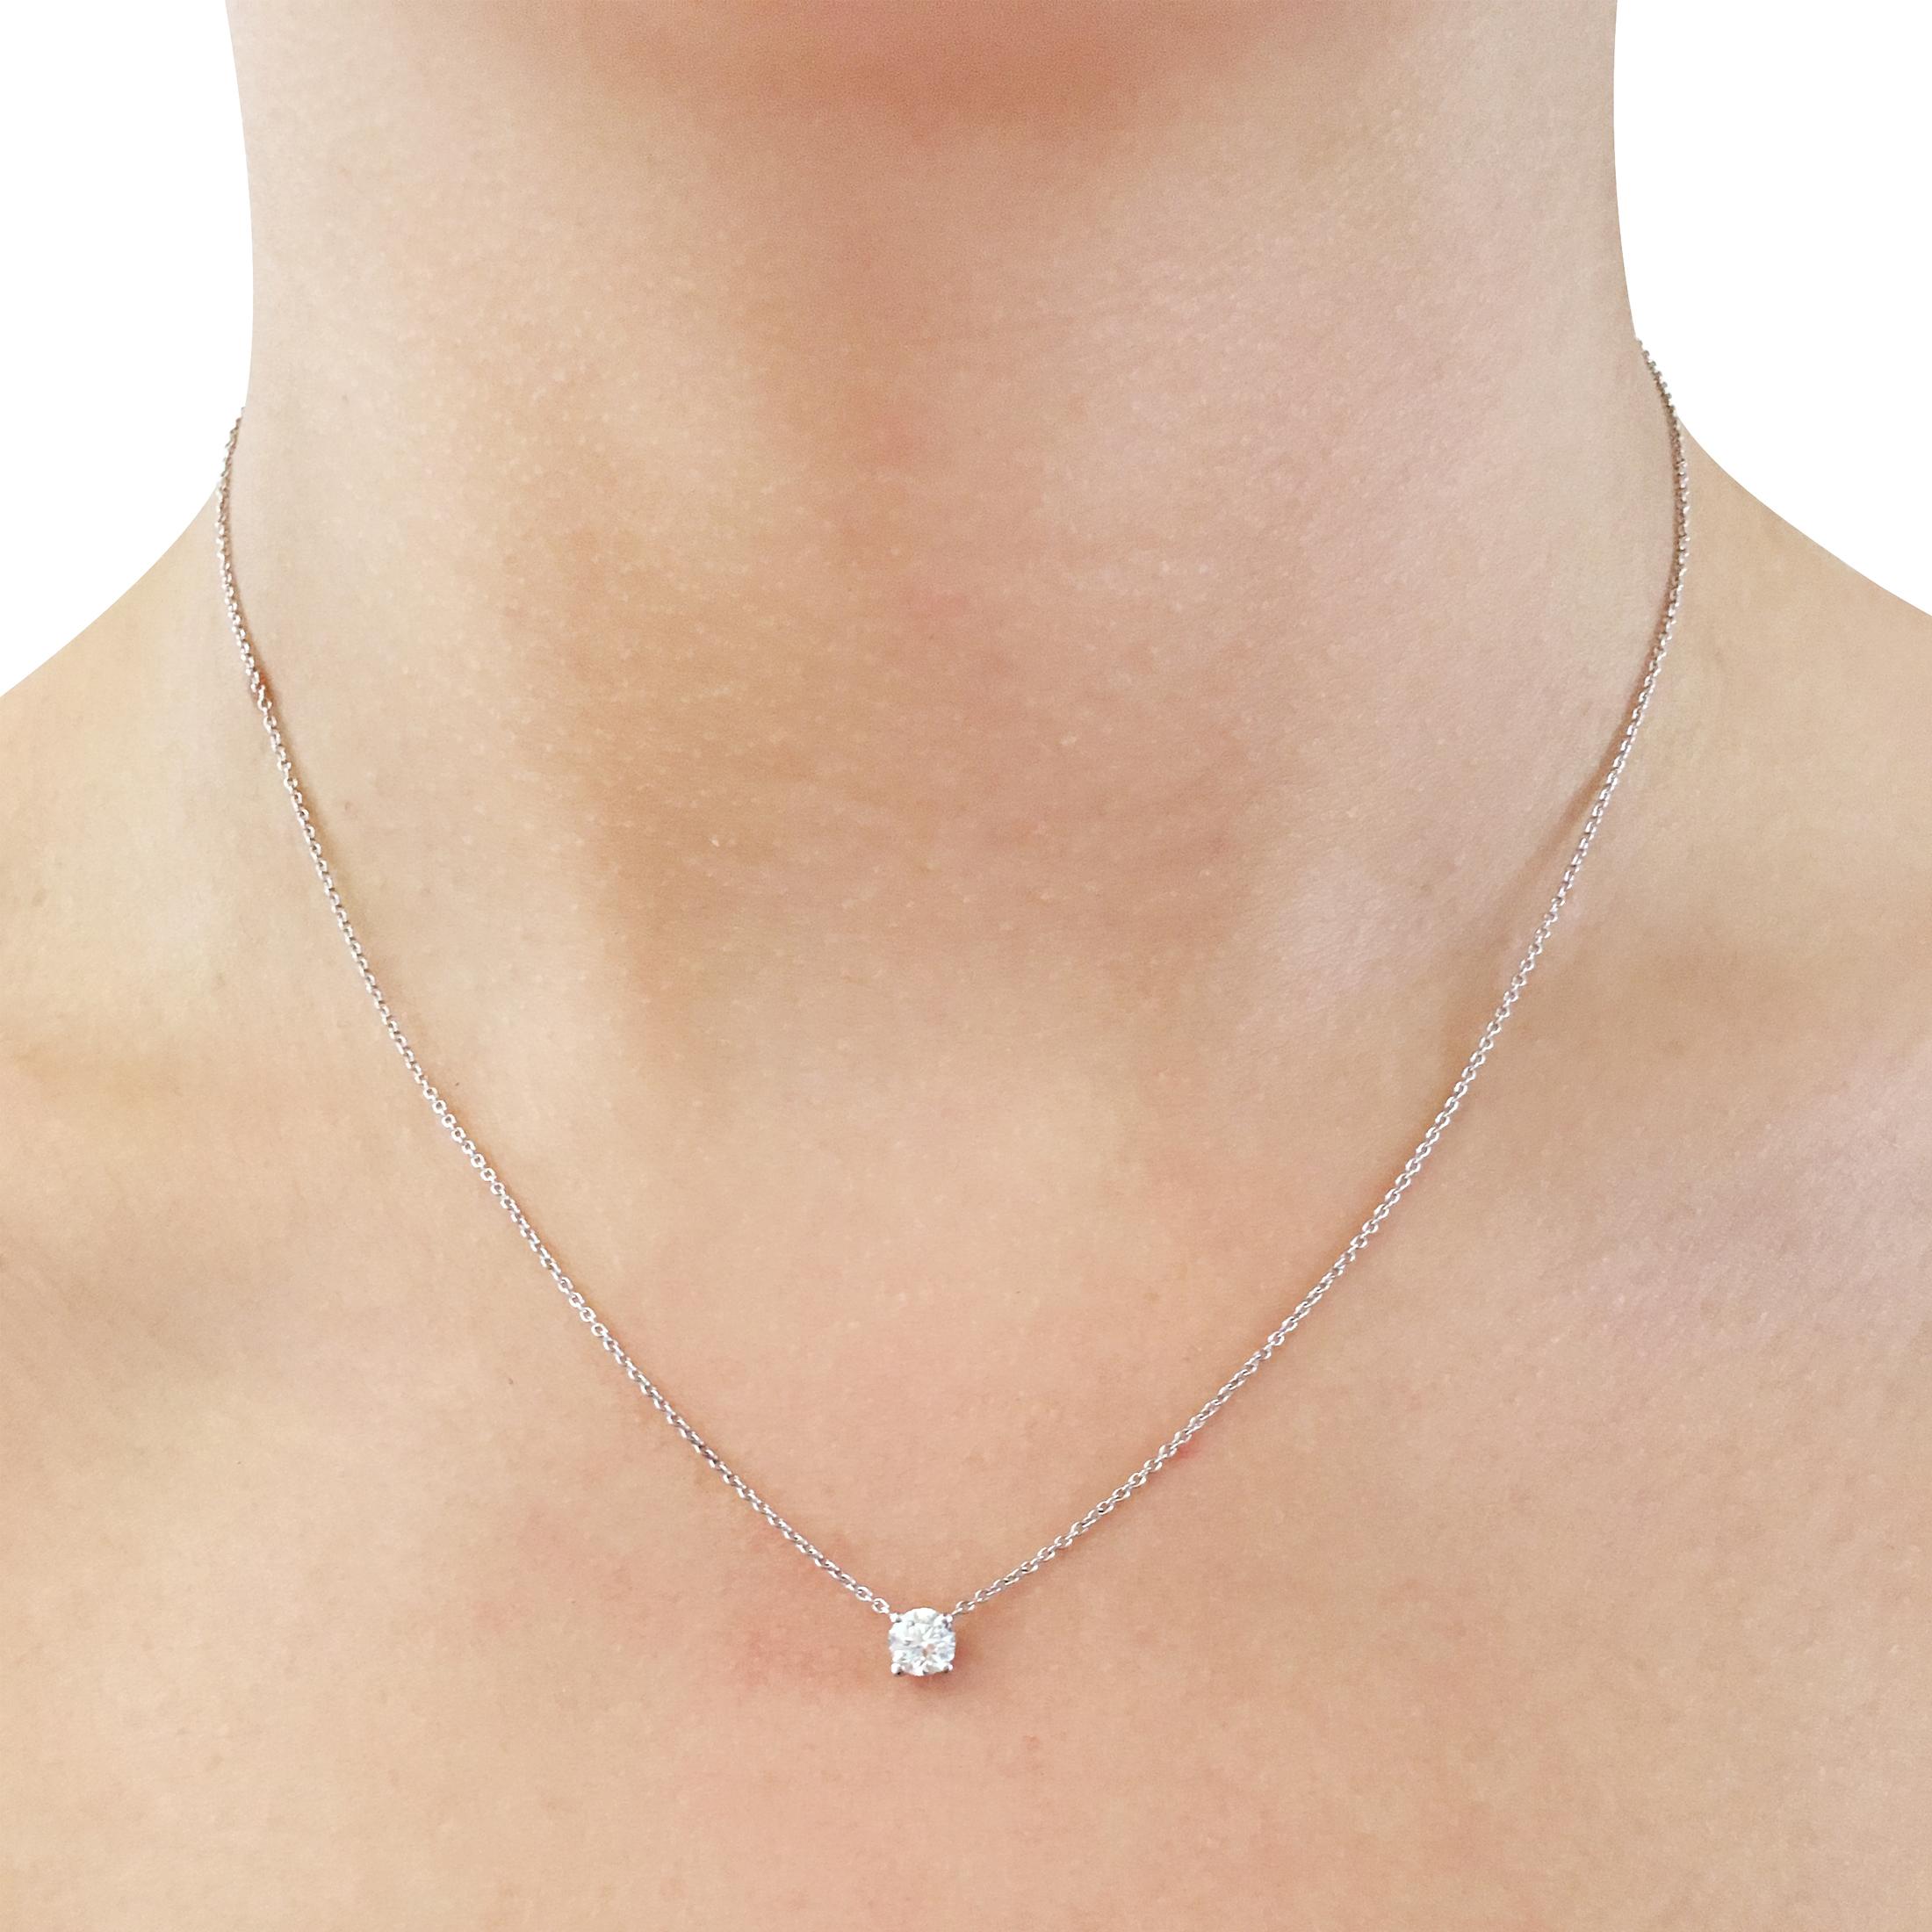 Single-stone-brilliant-cut-diamond-and-18ct-white-gold-floating-pendant-SN97-1.jpg